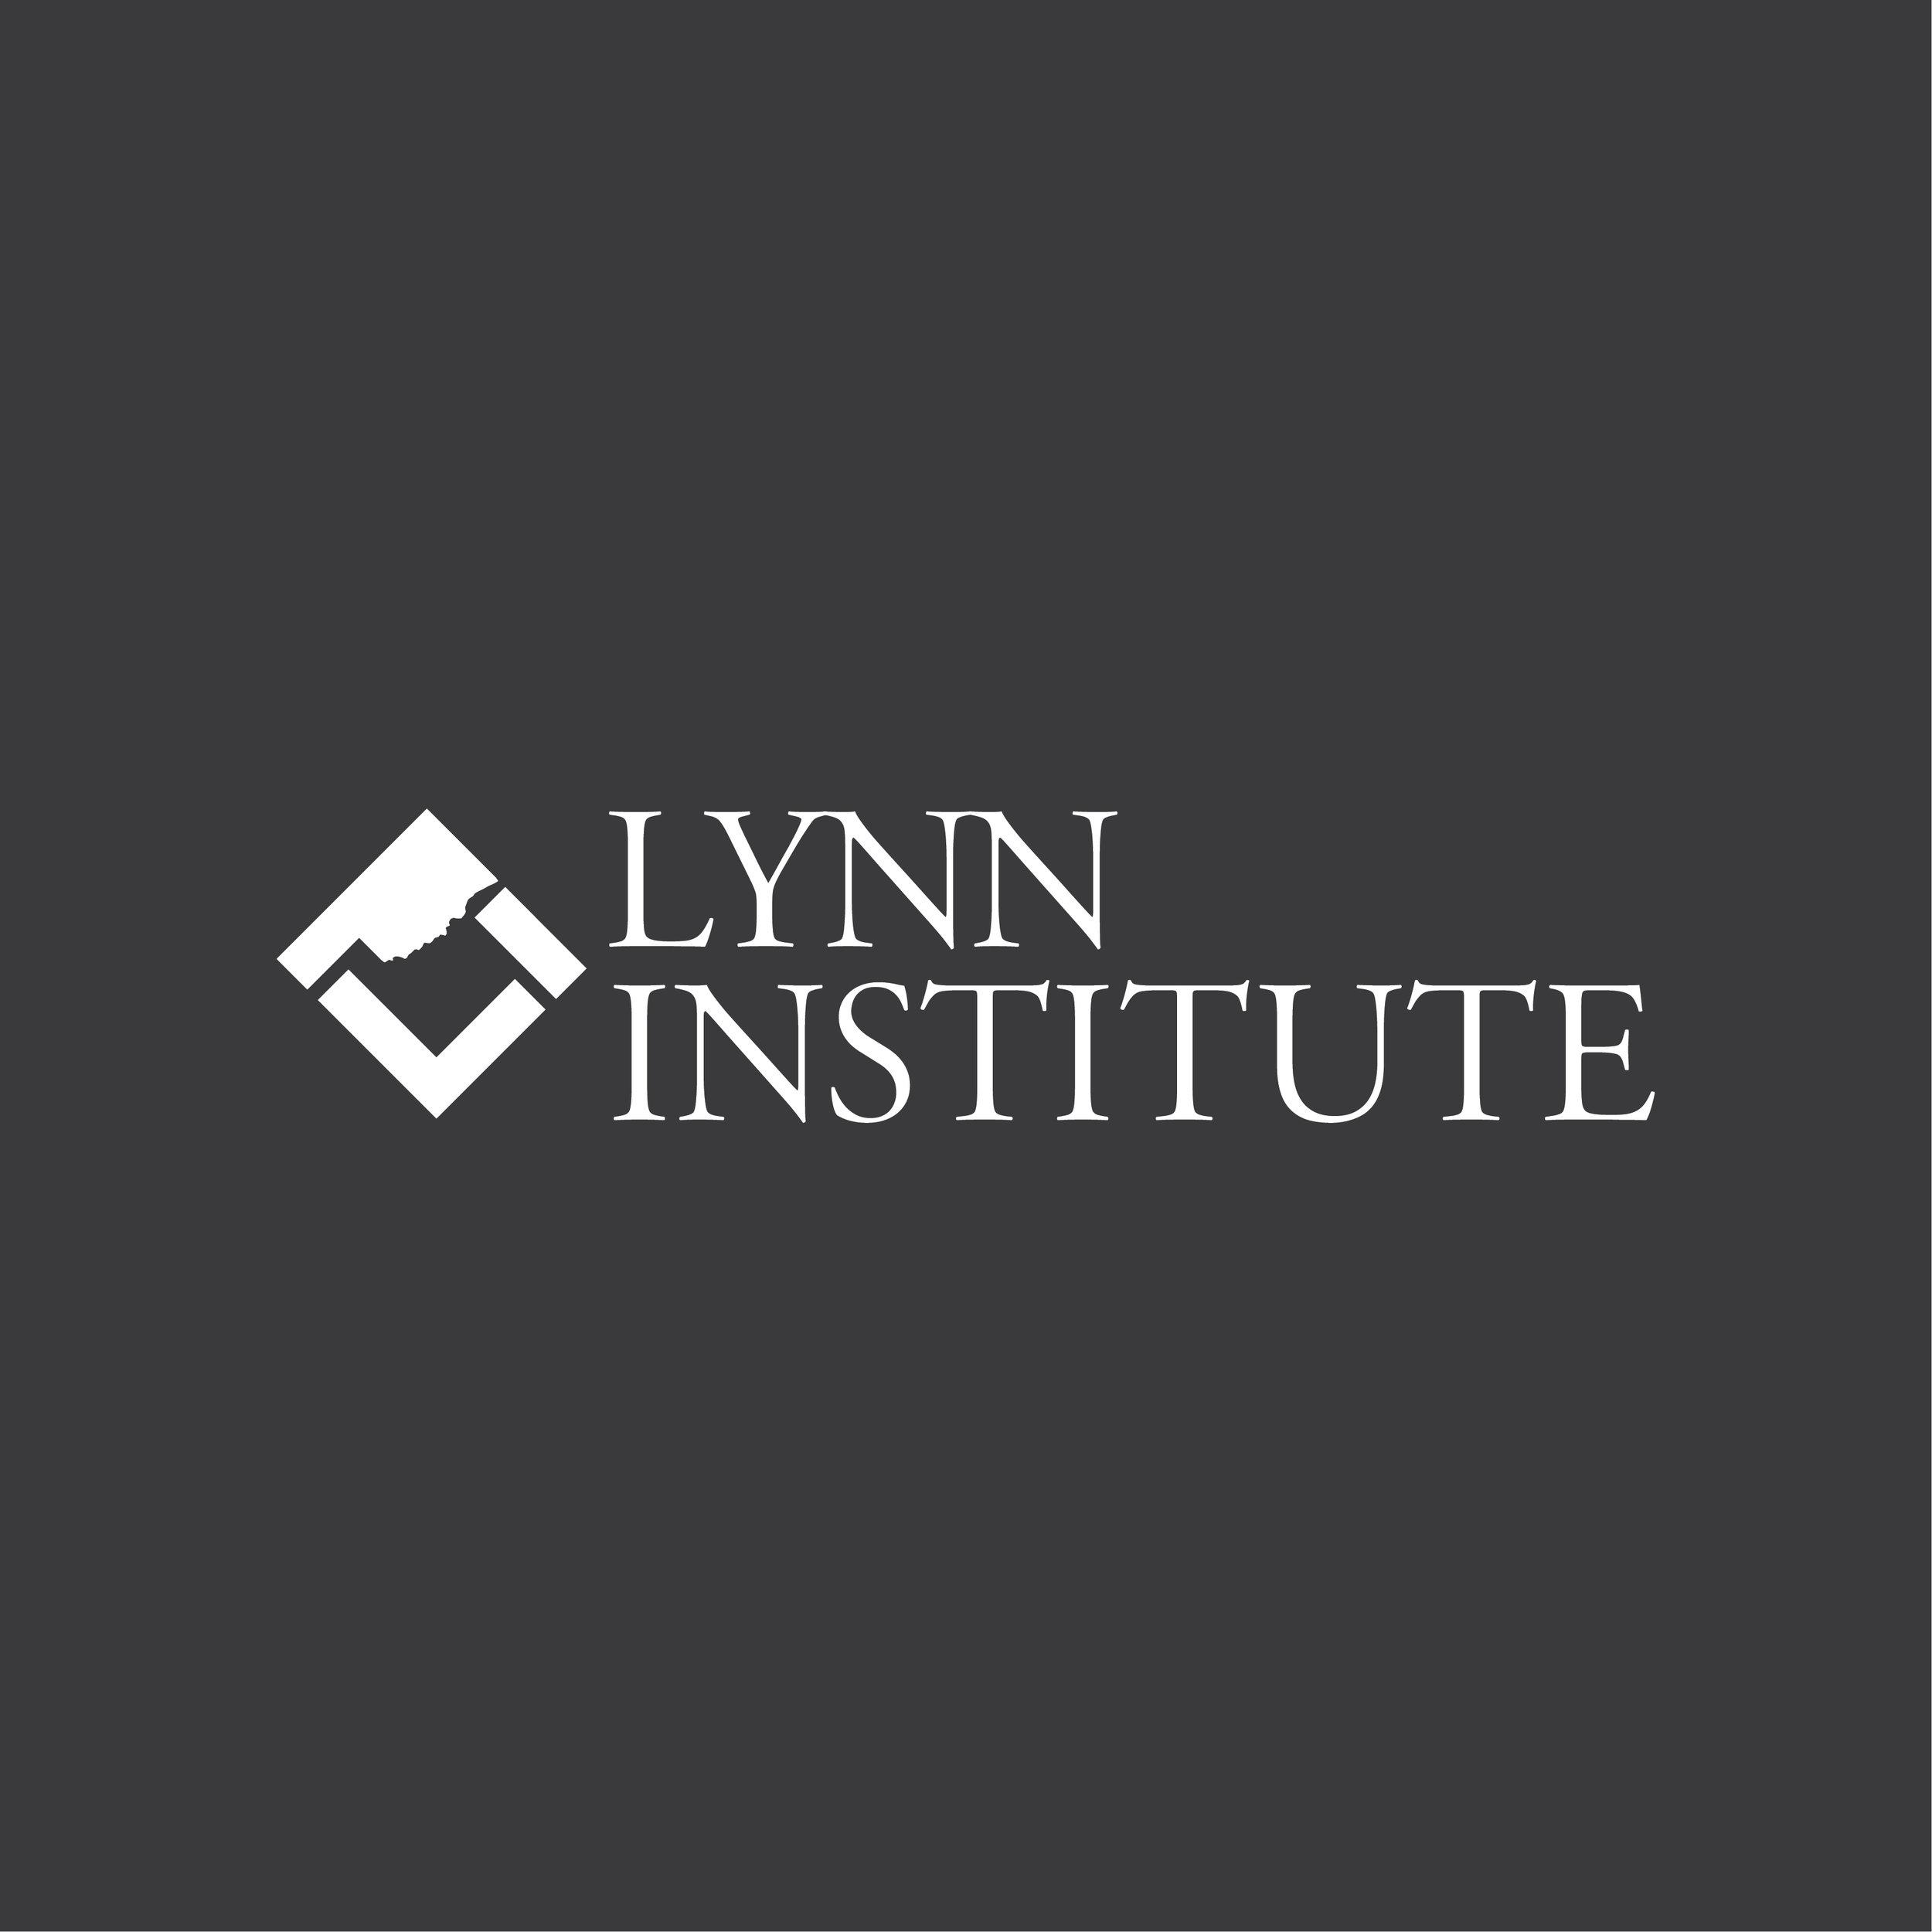 The Lynn Institute